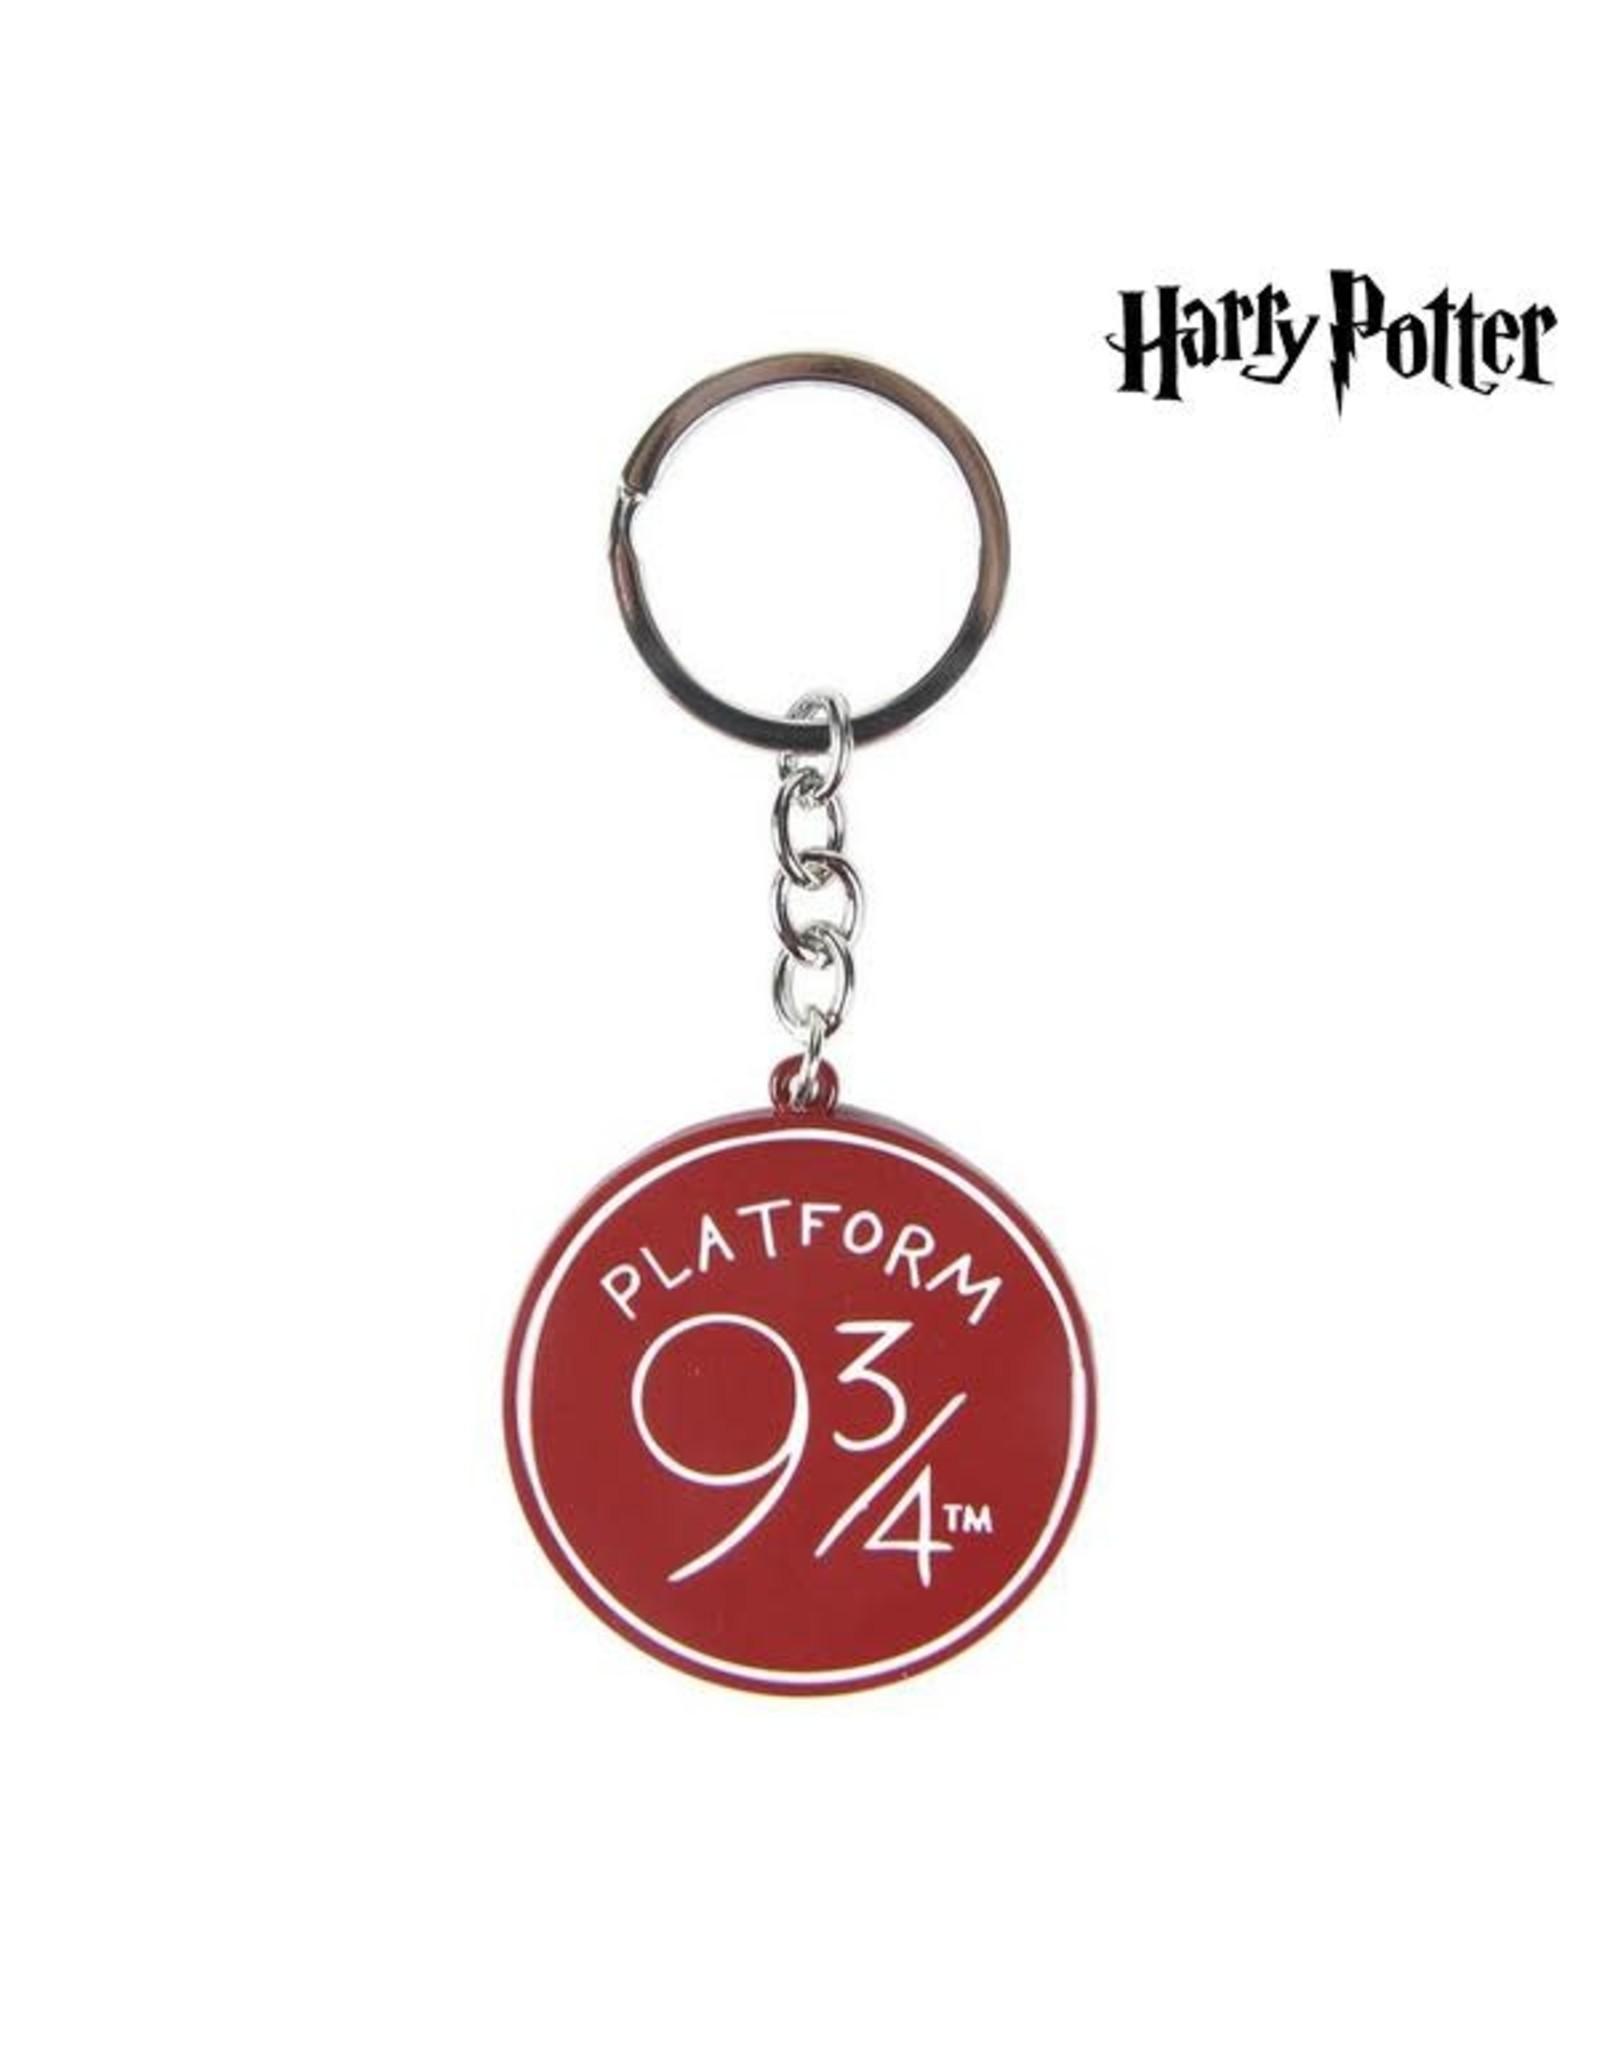 HARRY POTTER - Premium Keychain - B